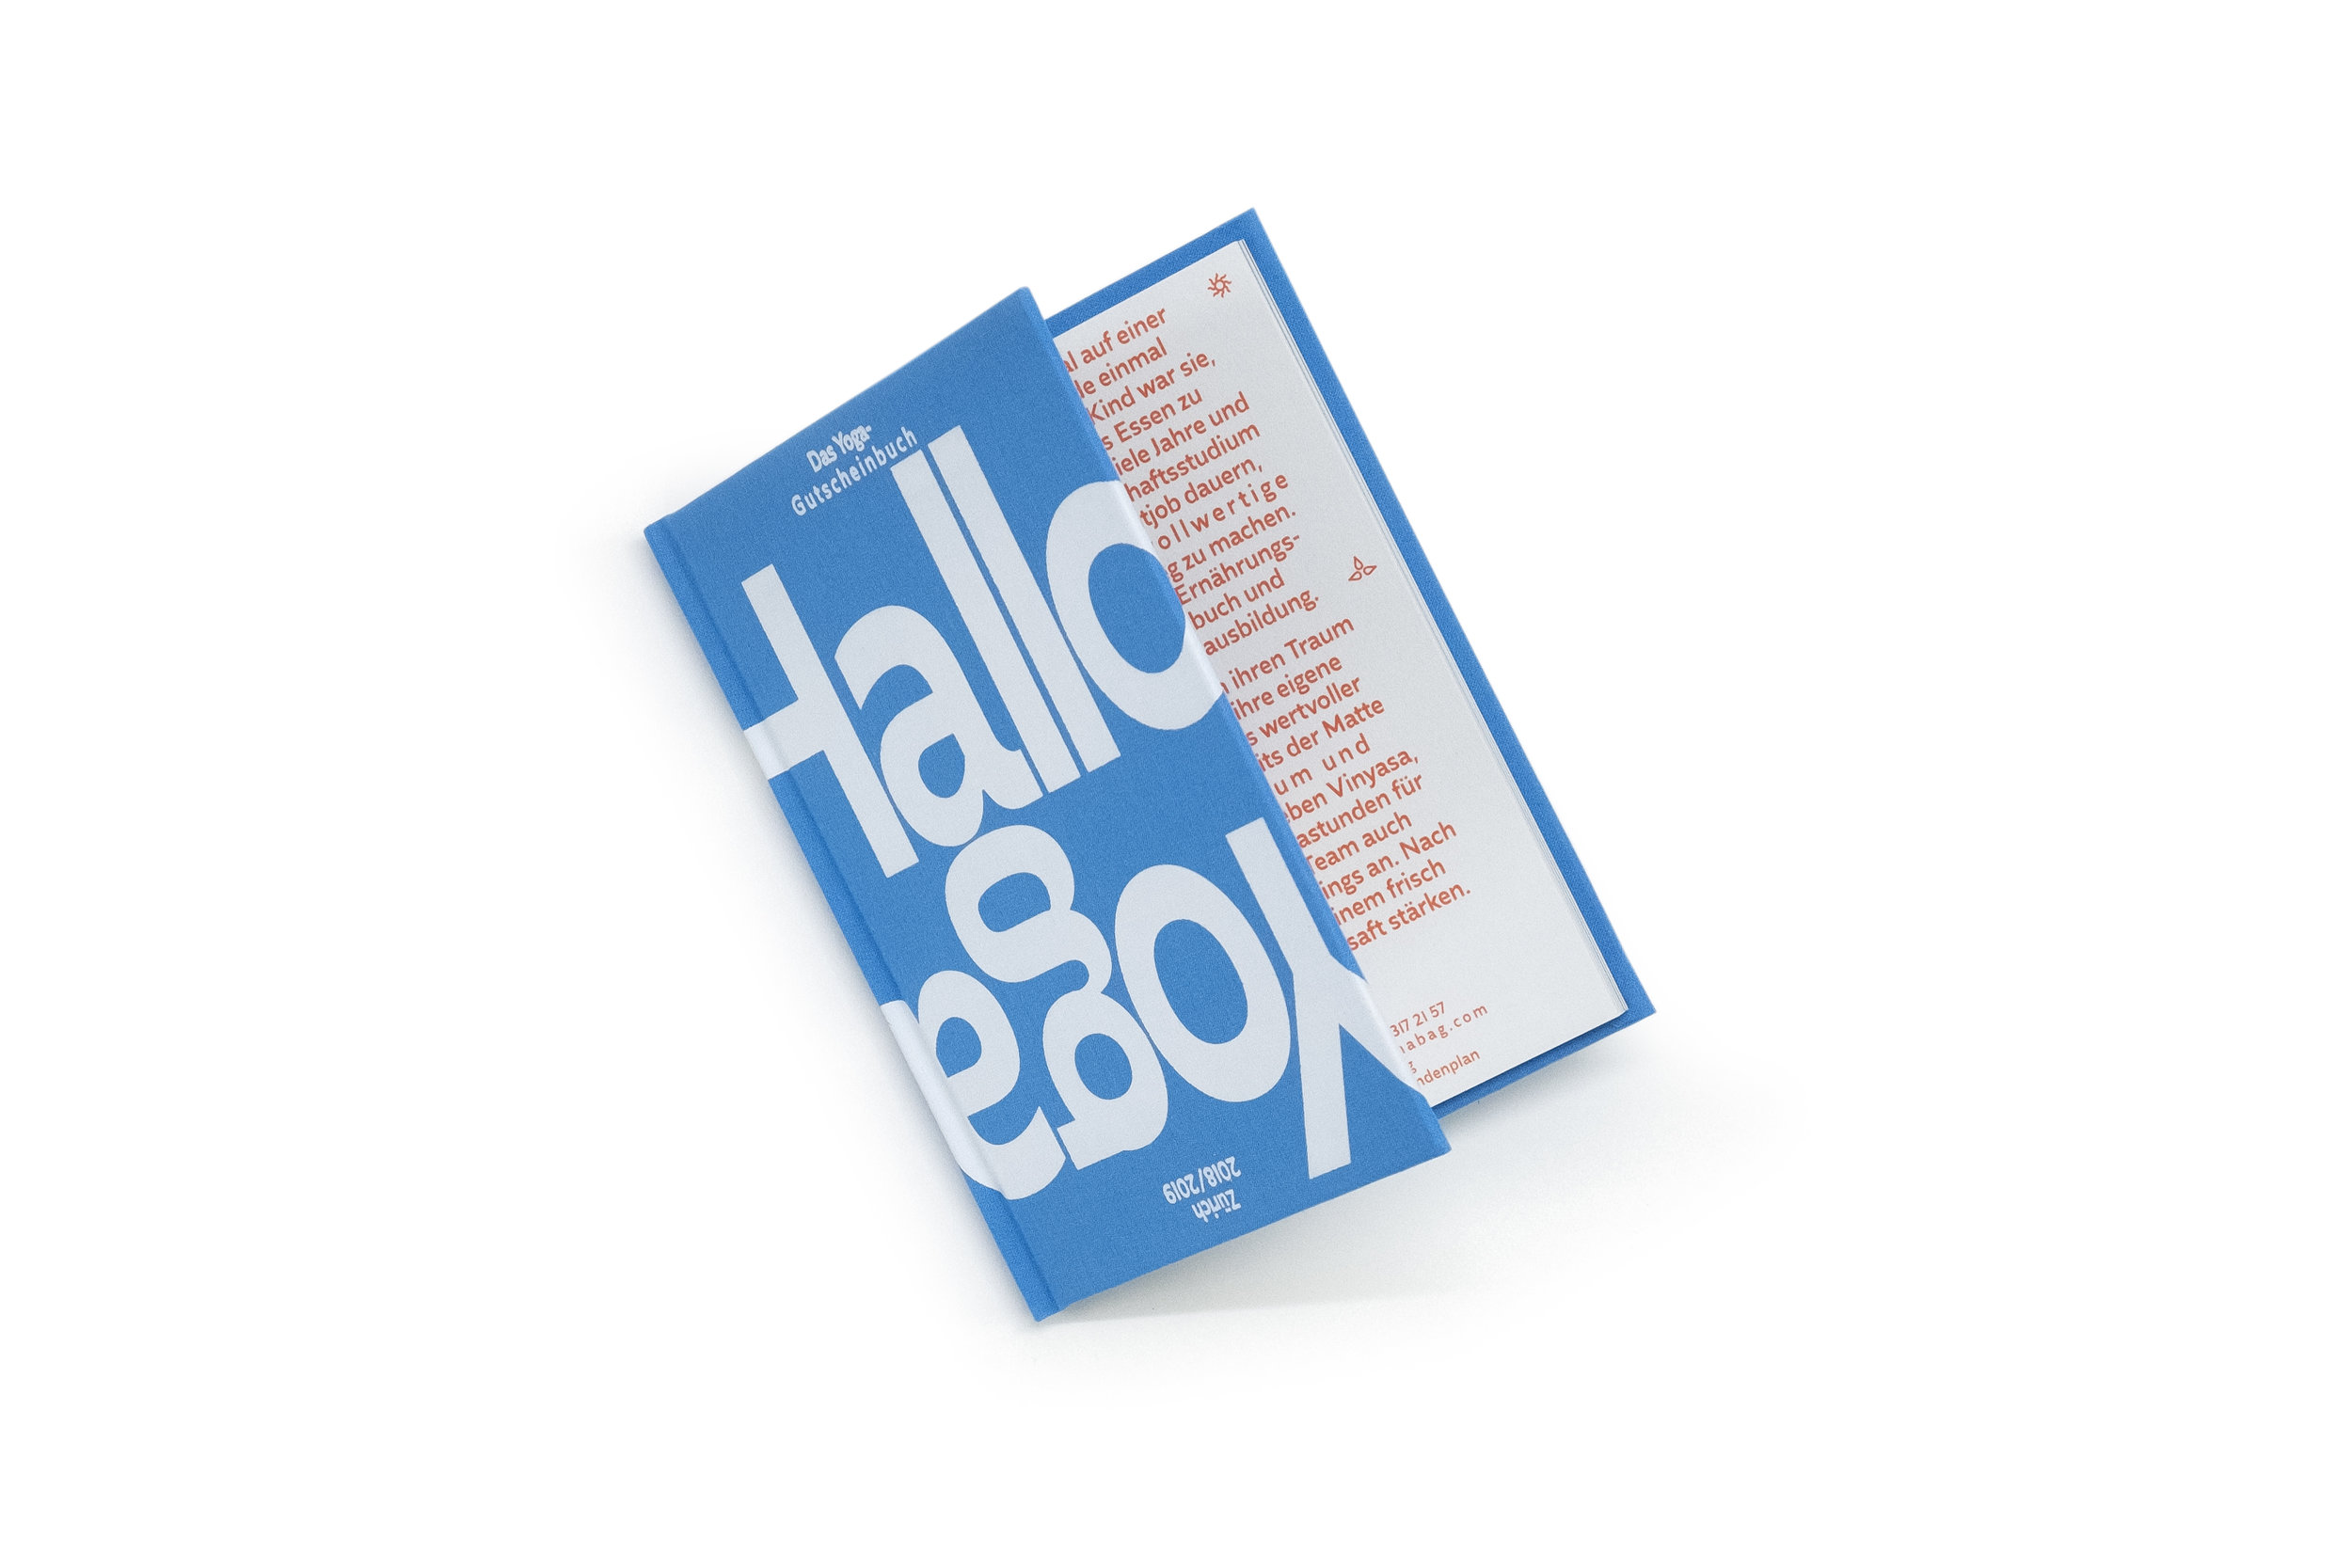 hallo-yoga-3-buch-3.jpg